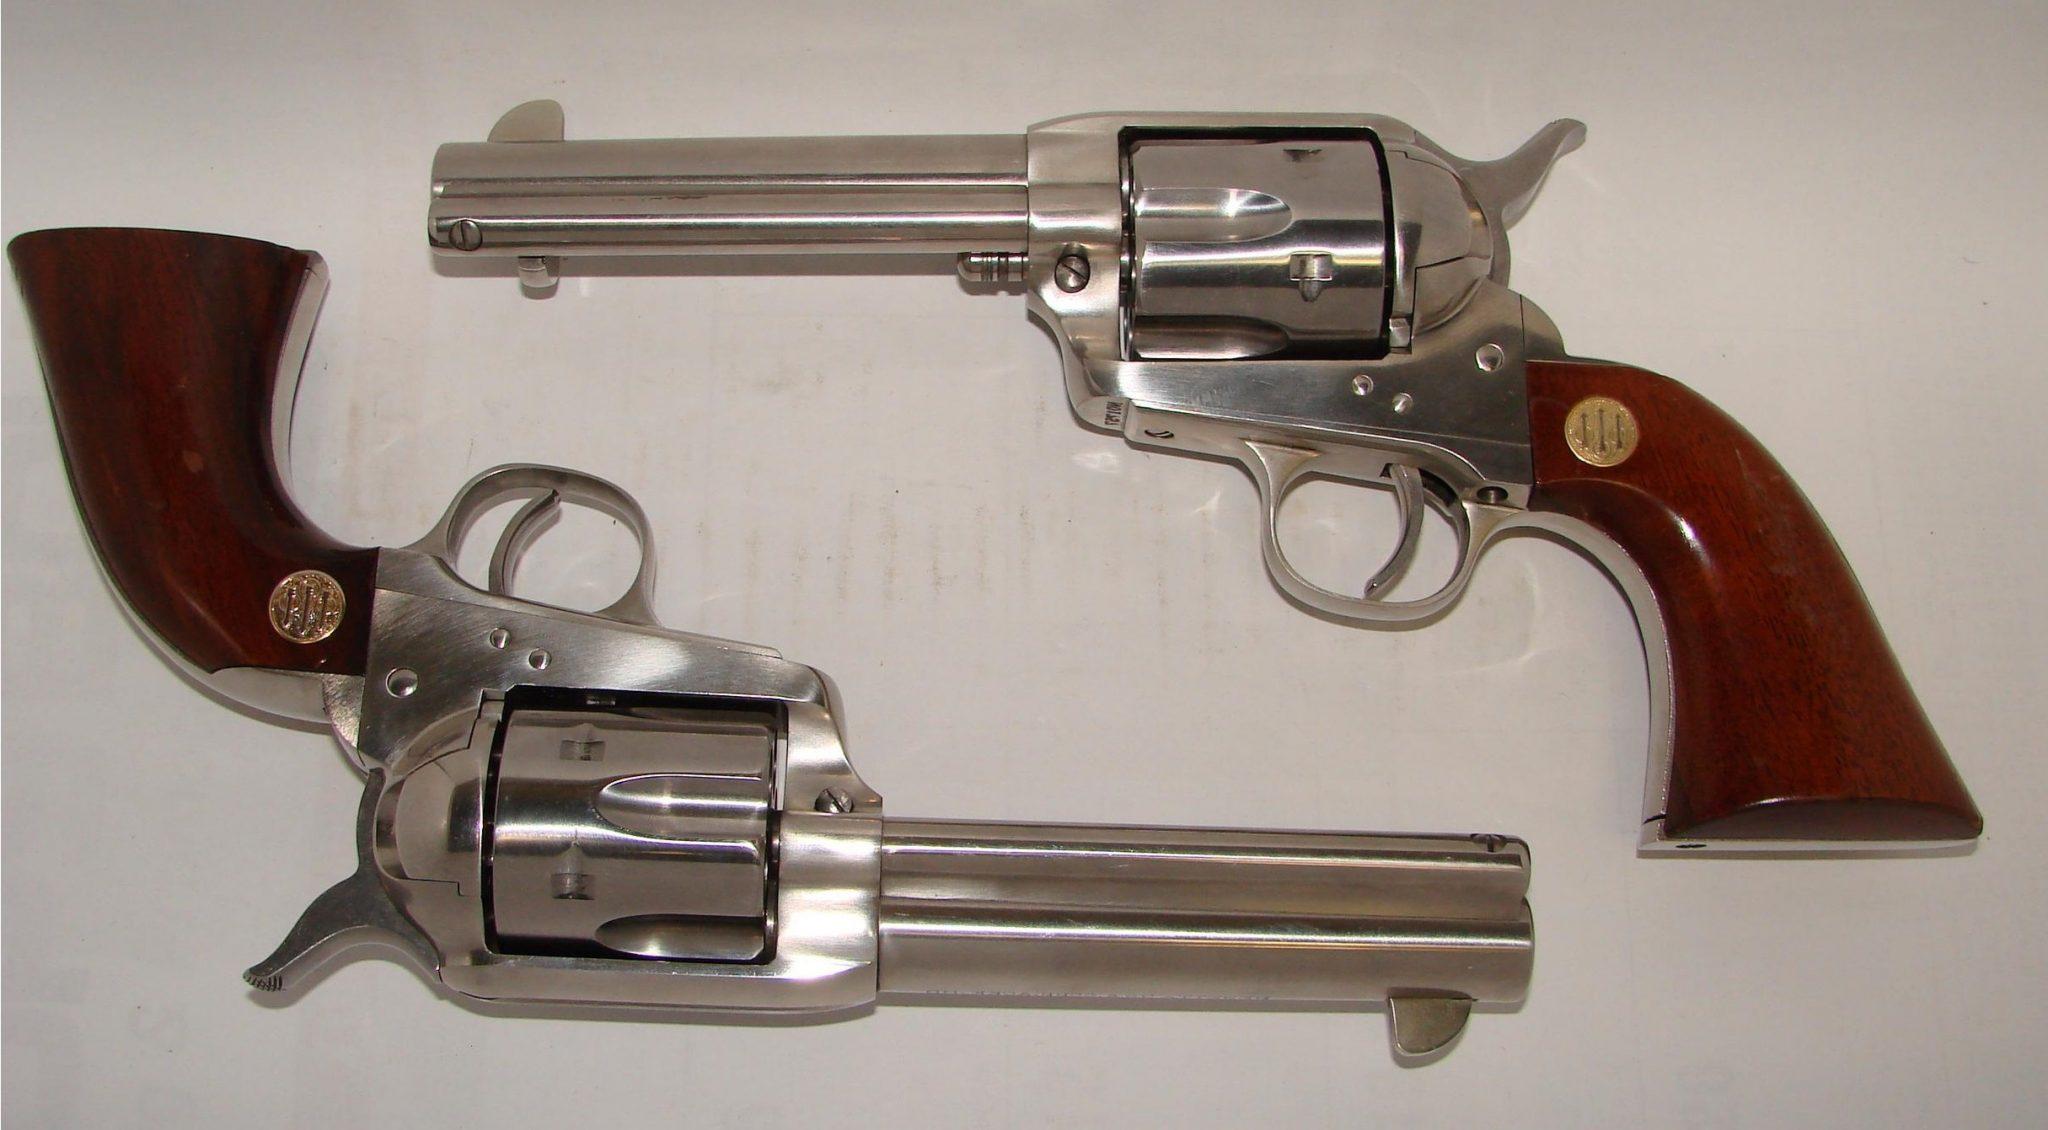 Beretta-Stampede-Inox-Consecutive-Set_100863532_74823_B75DD5E5B7C24369bbb